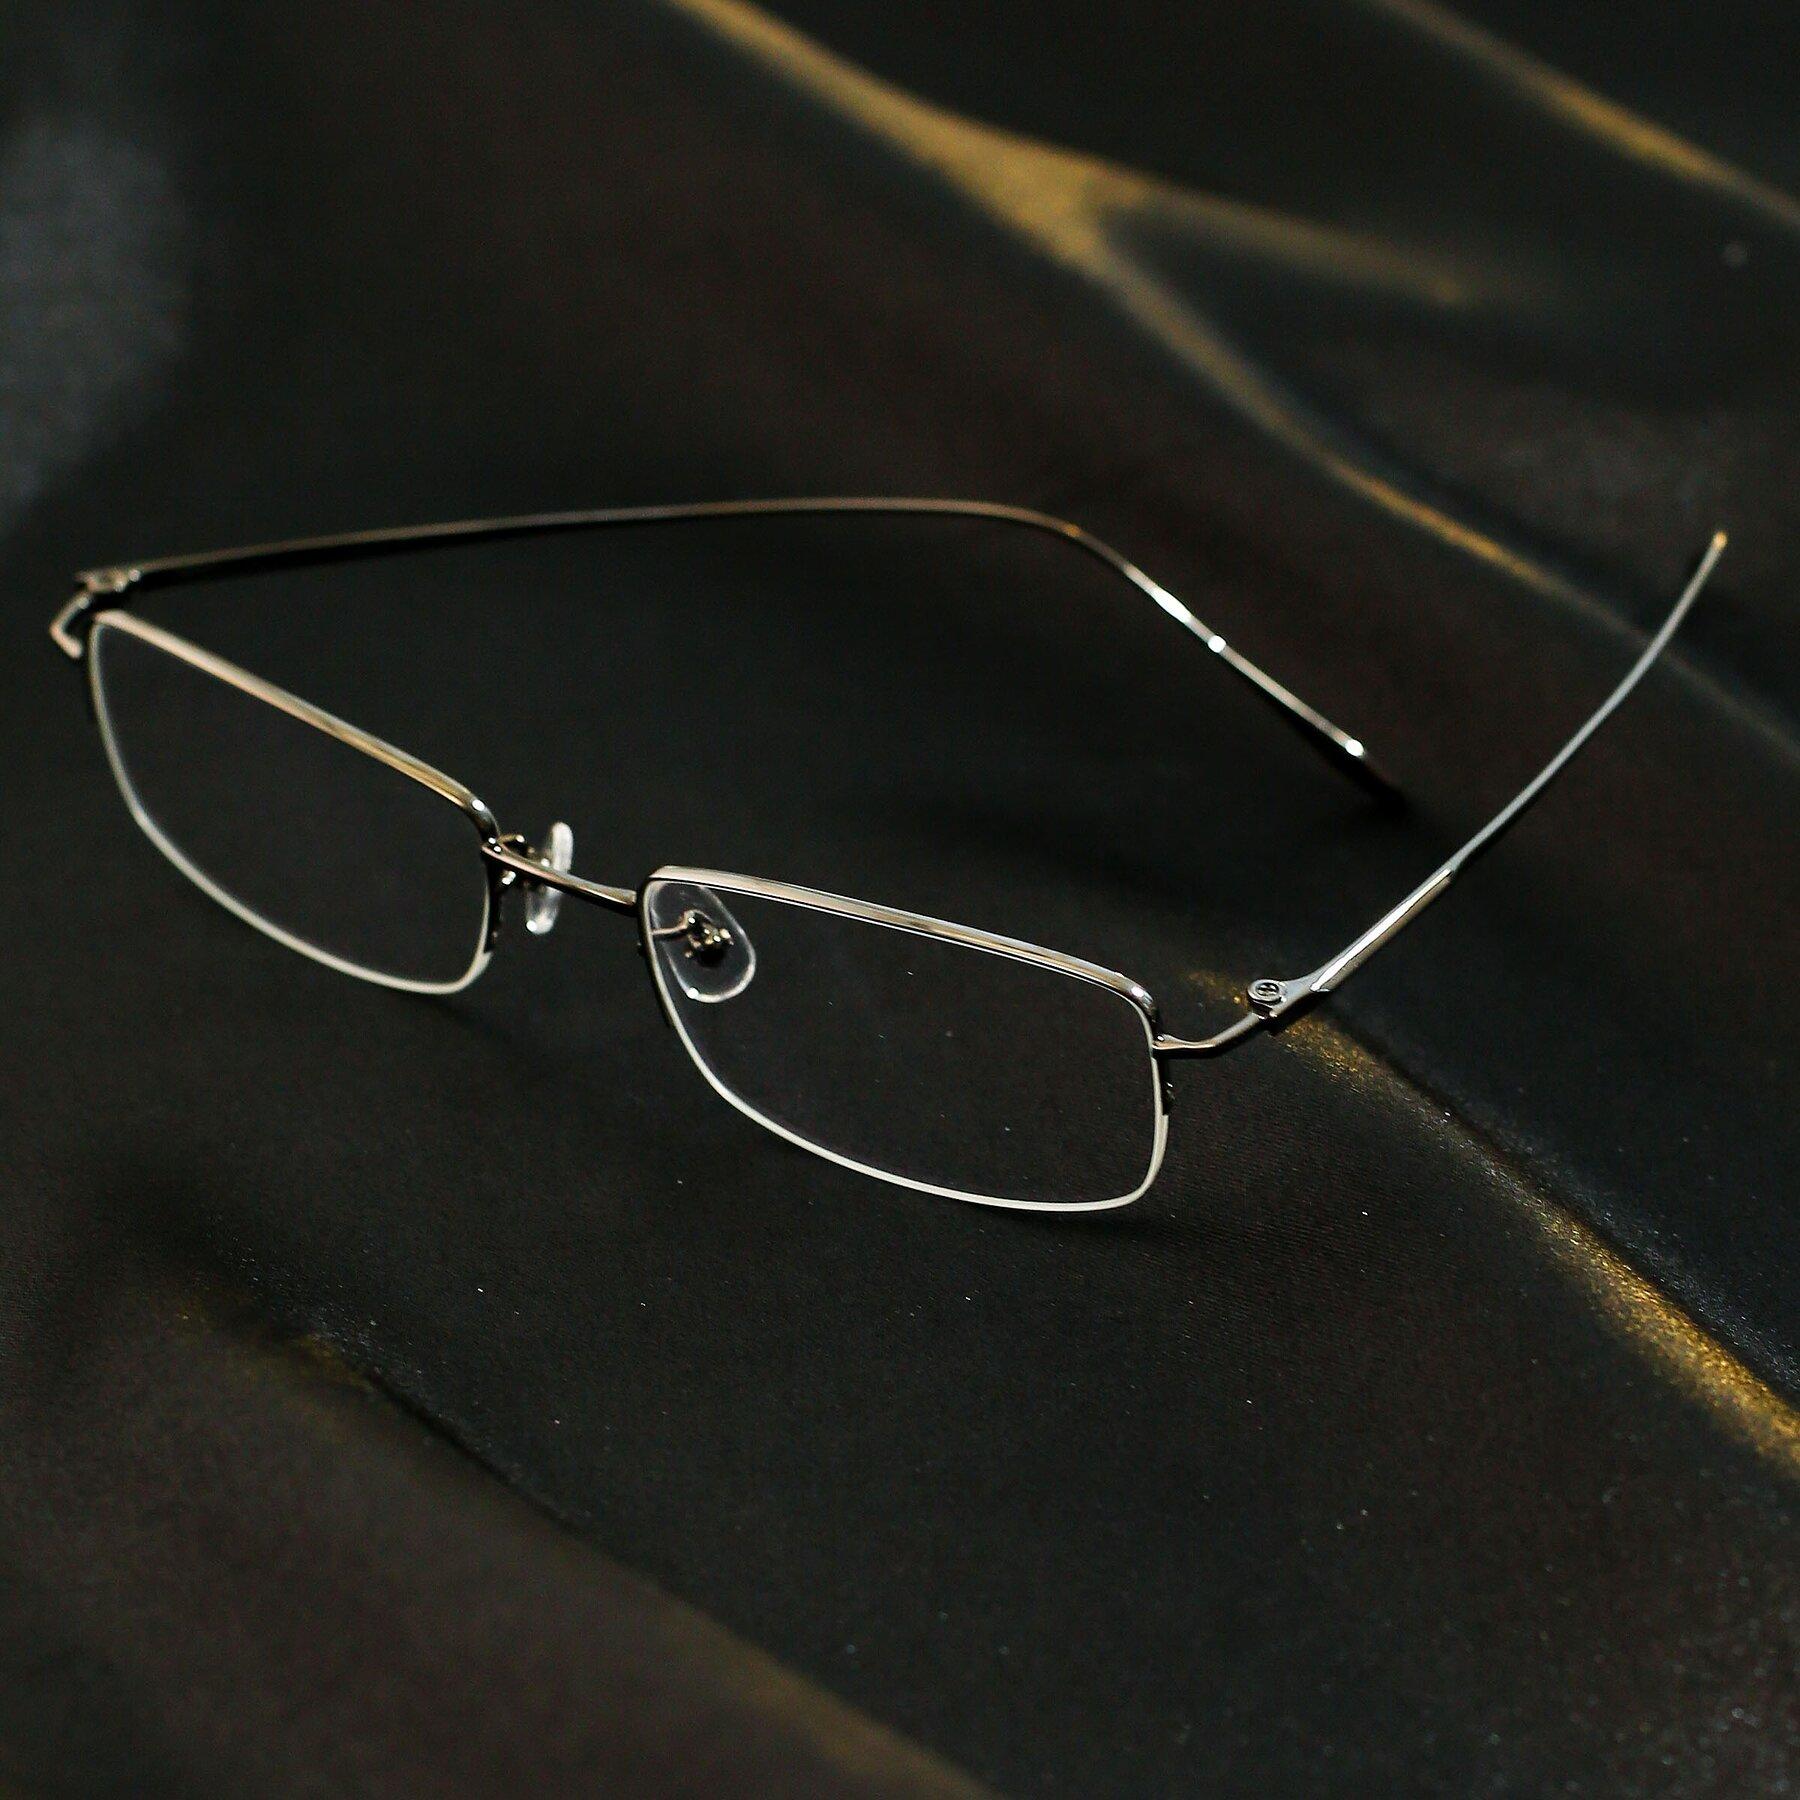 Lifestyle photography #2 of Duke in Matt Black with Clear Eyeglass Lenses